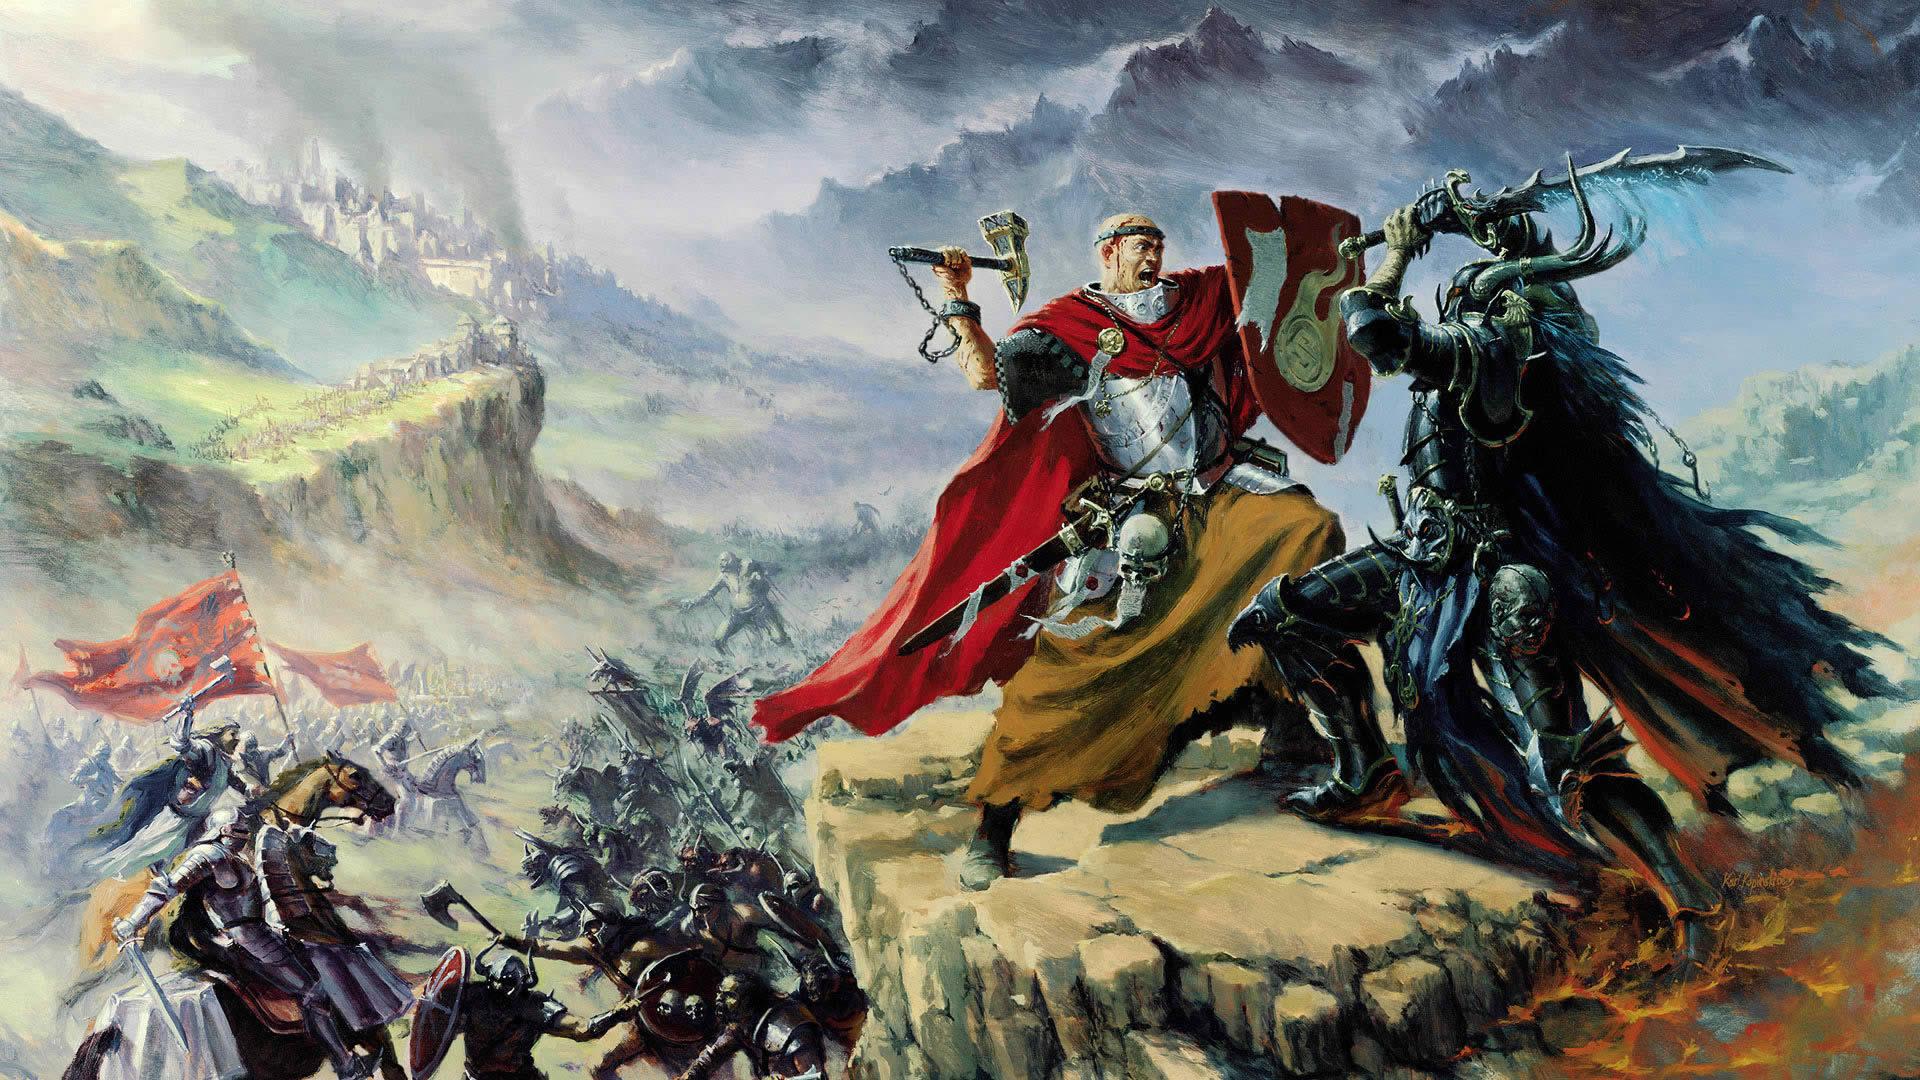 Epic Battle Scene Wallpaper